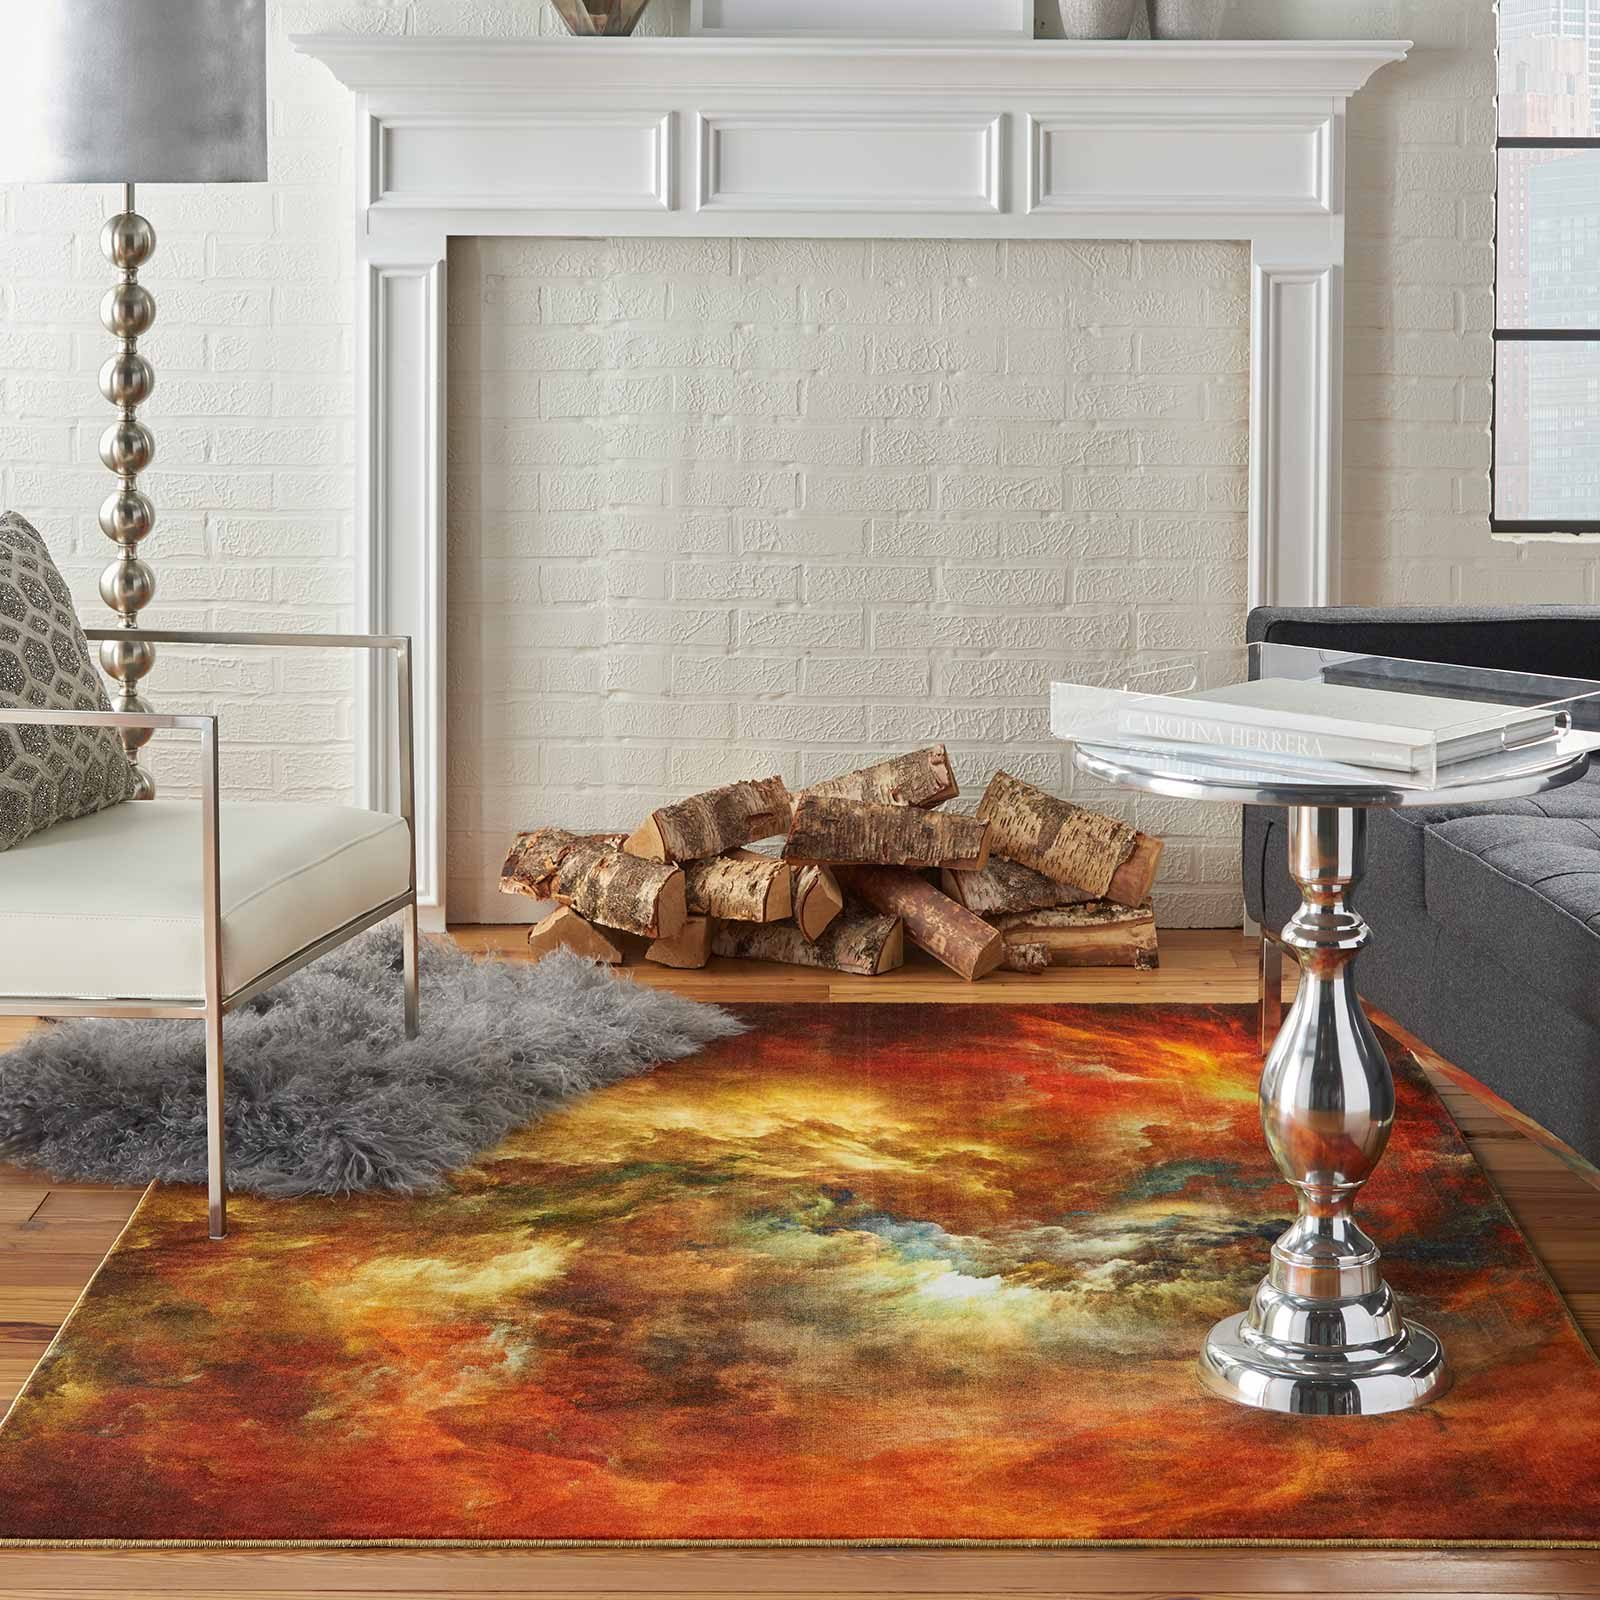 Nourison rug LREVE LER07 REDMT RED MULTI 5X7 099446494818 interior 1 C